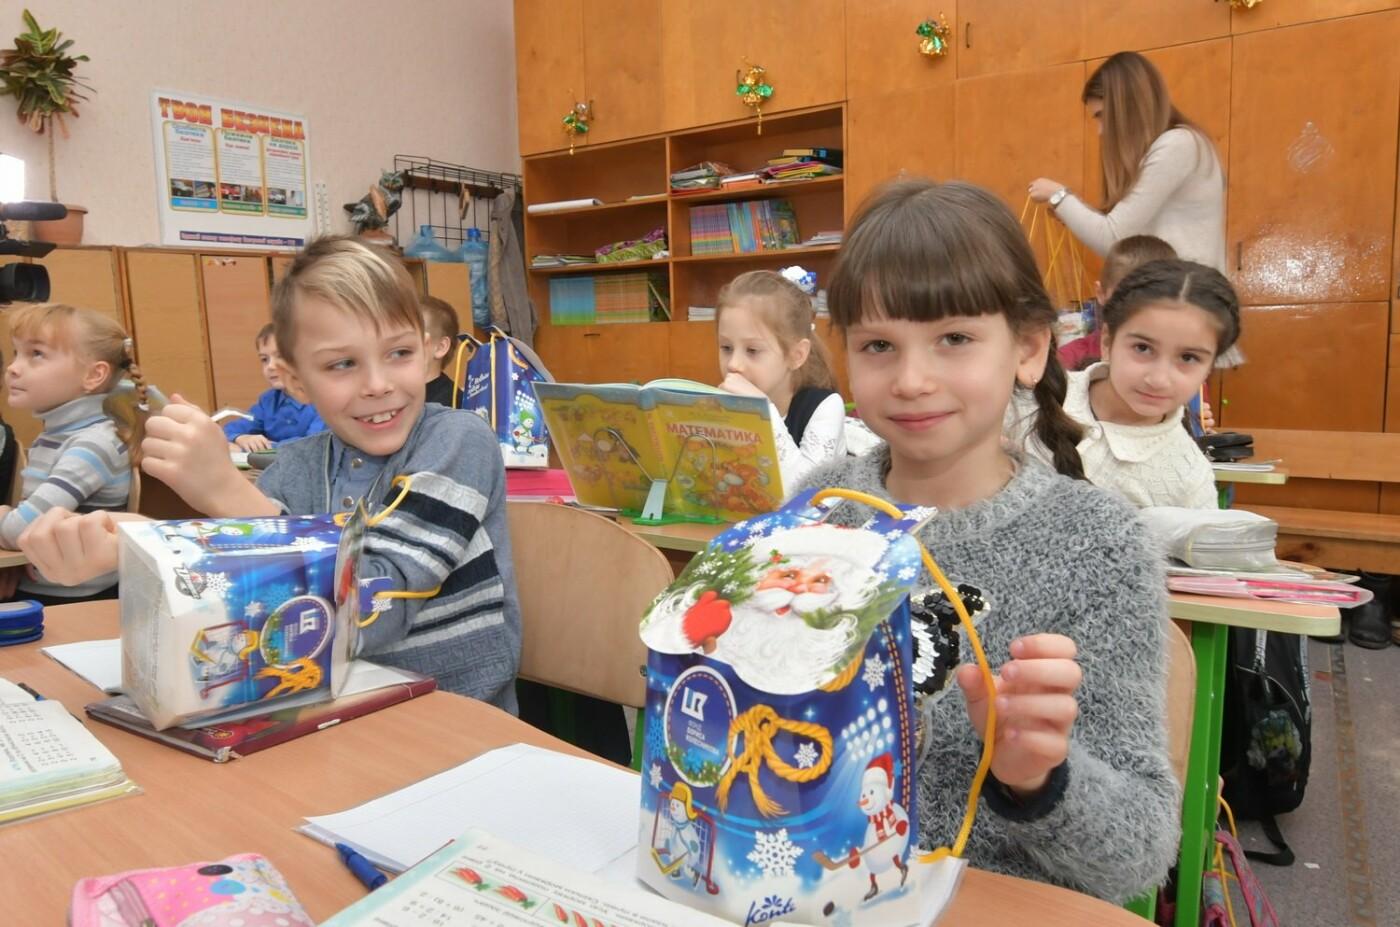 54000 детей Донбасса получили от Бориса Колесникова новогодние подарки, фото-1